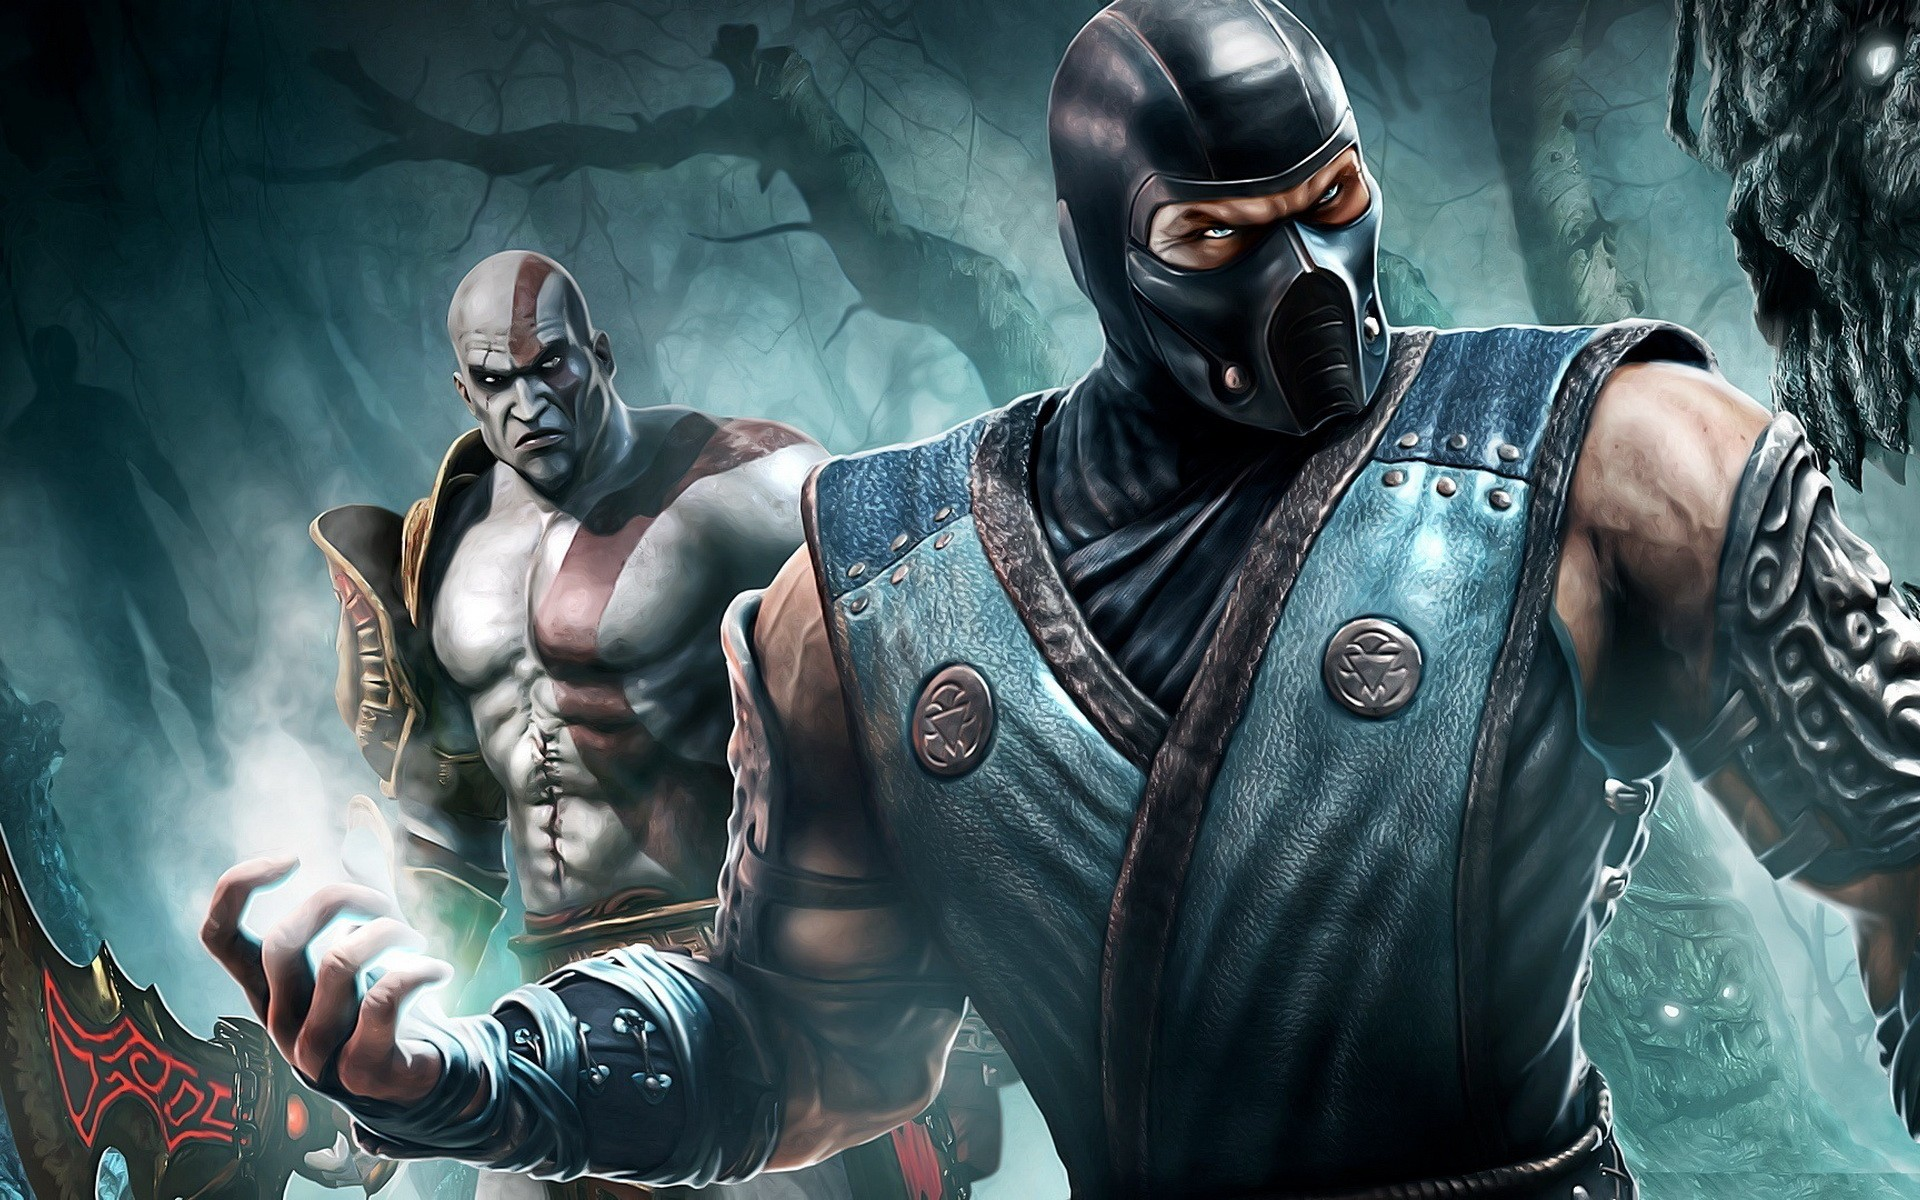 Video Games Mortal Kombat Wallpaper